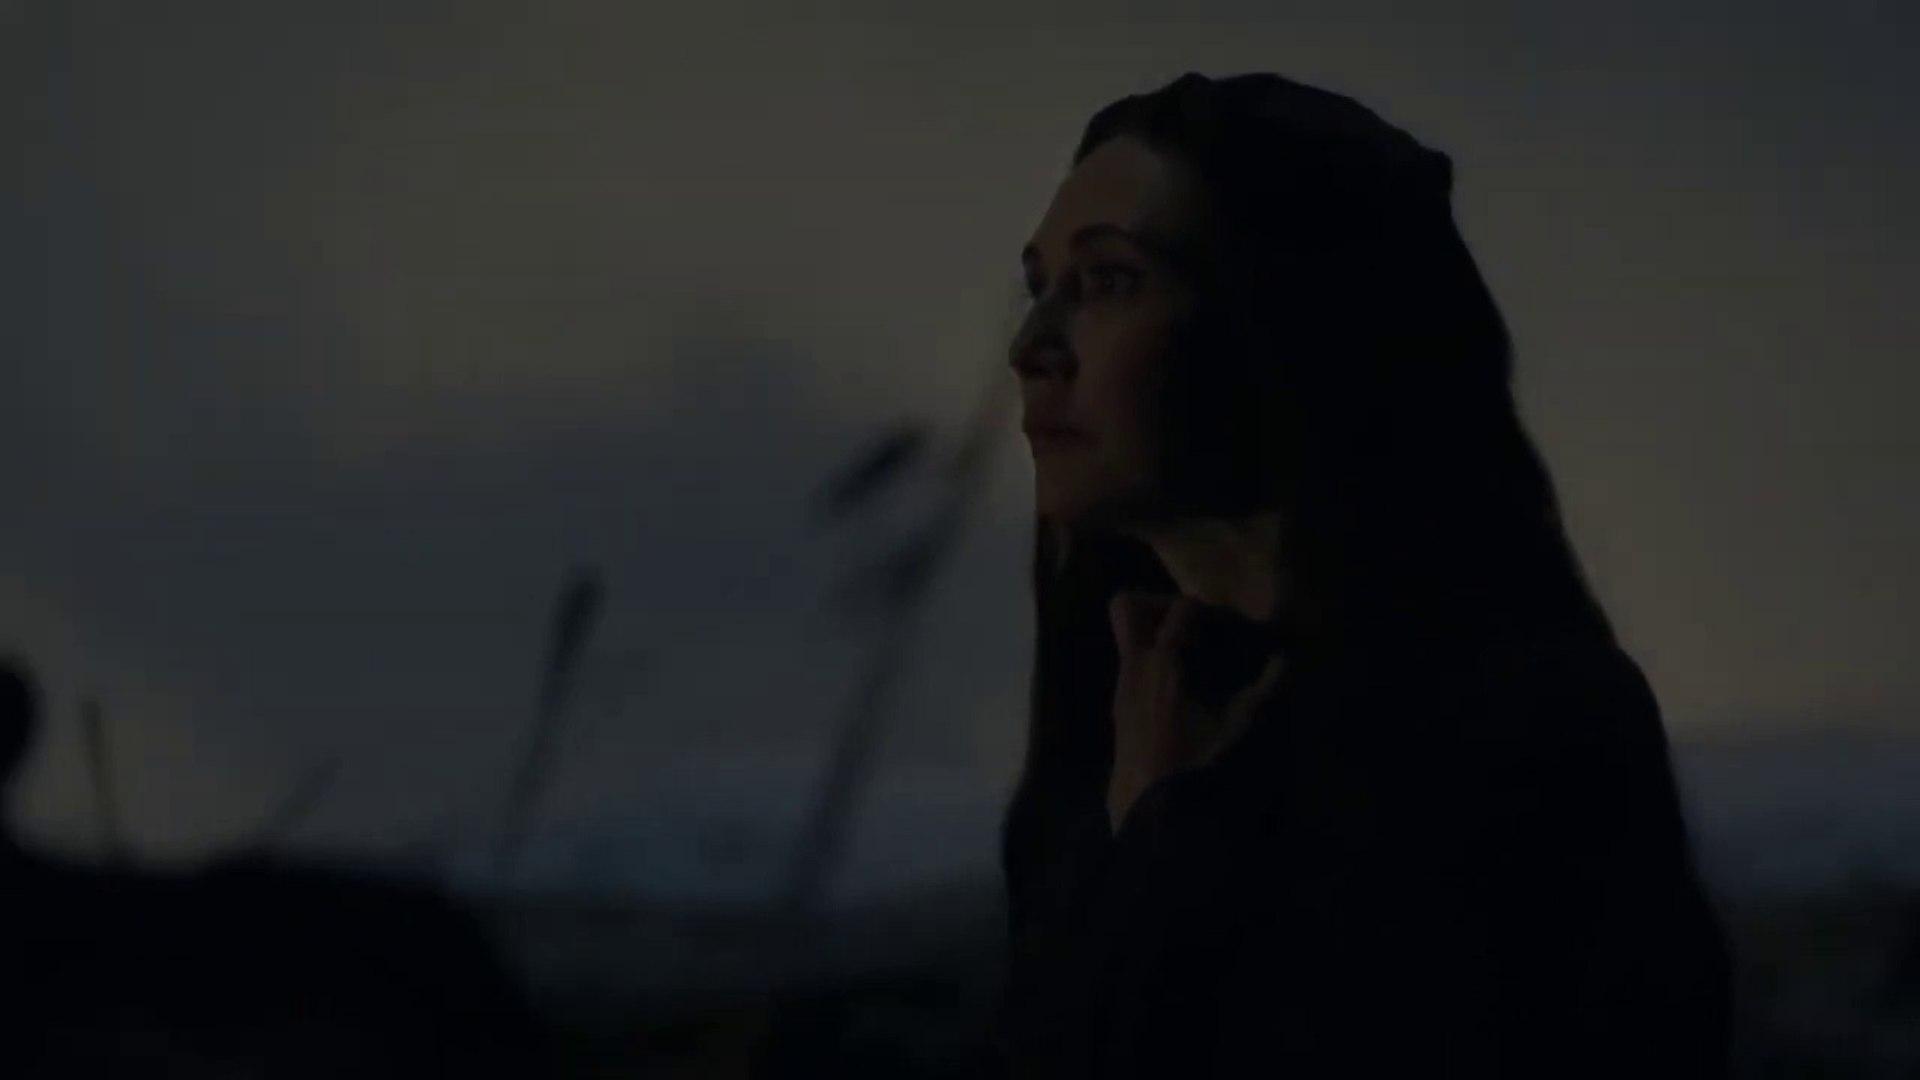 Melisandre Died Final Scene Game of Thrones Season 8 Episode 3